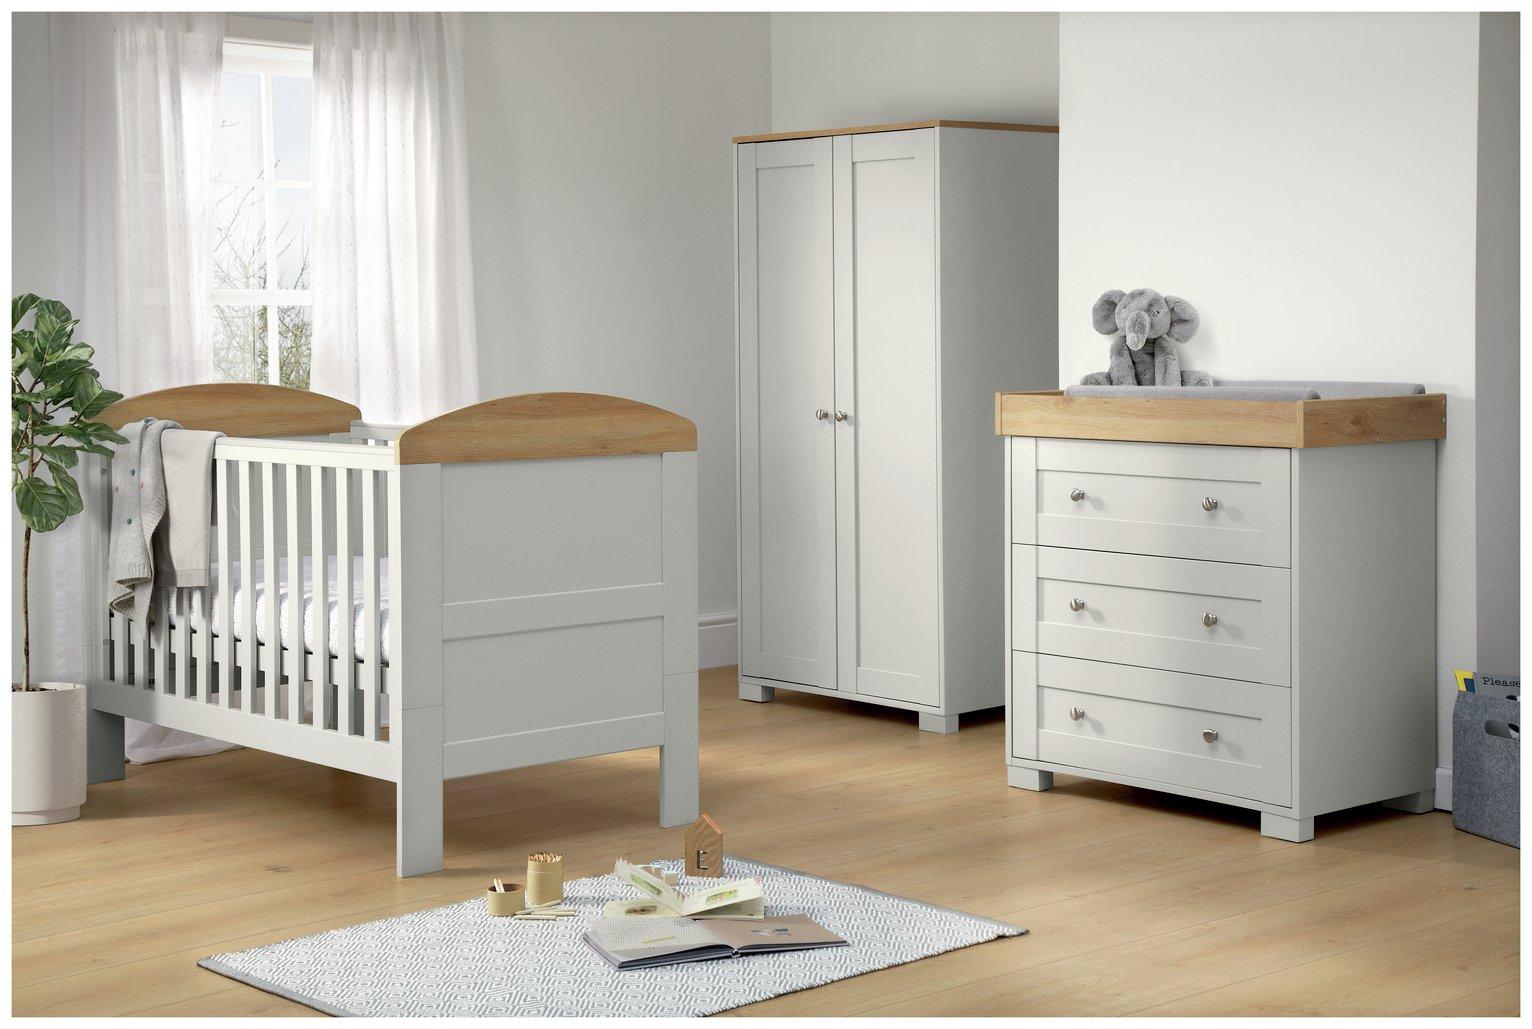 mamas papas harrow 3 piece furniture set review. Black Bedroom Furniture Sets. Home Design Ideas